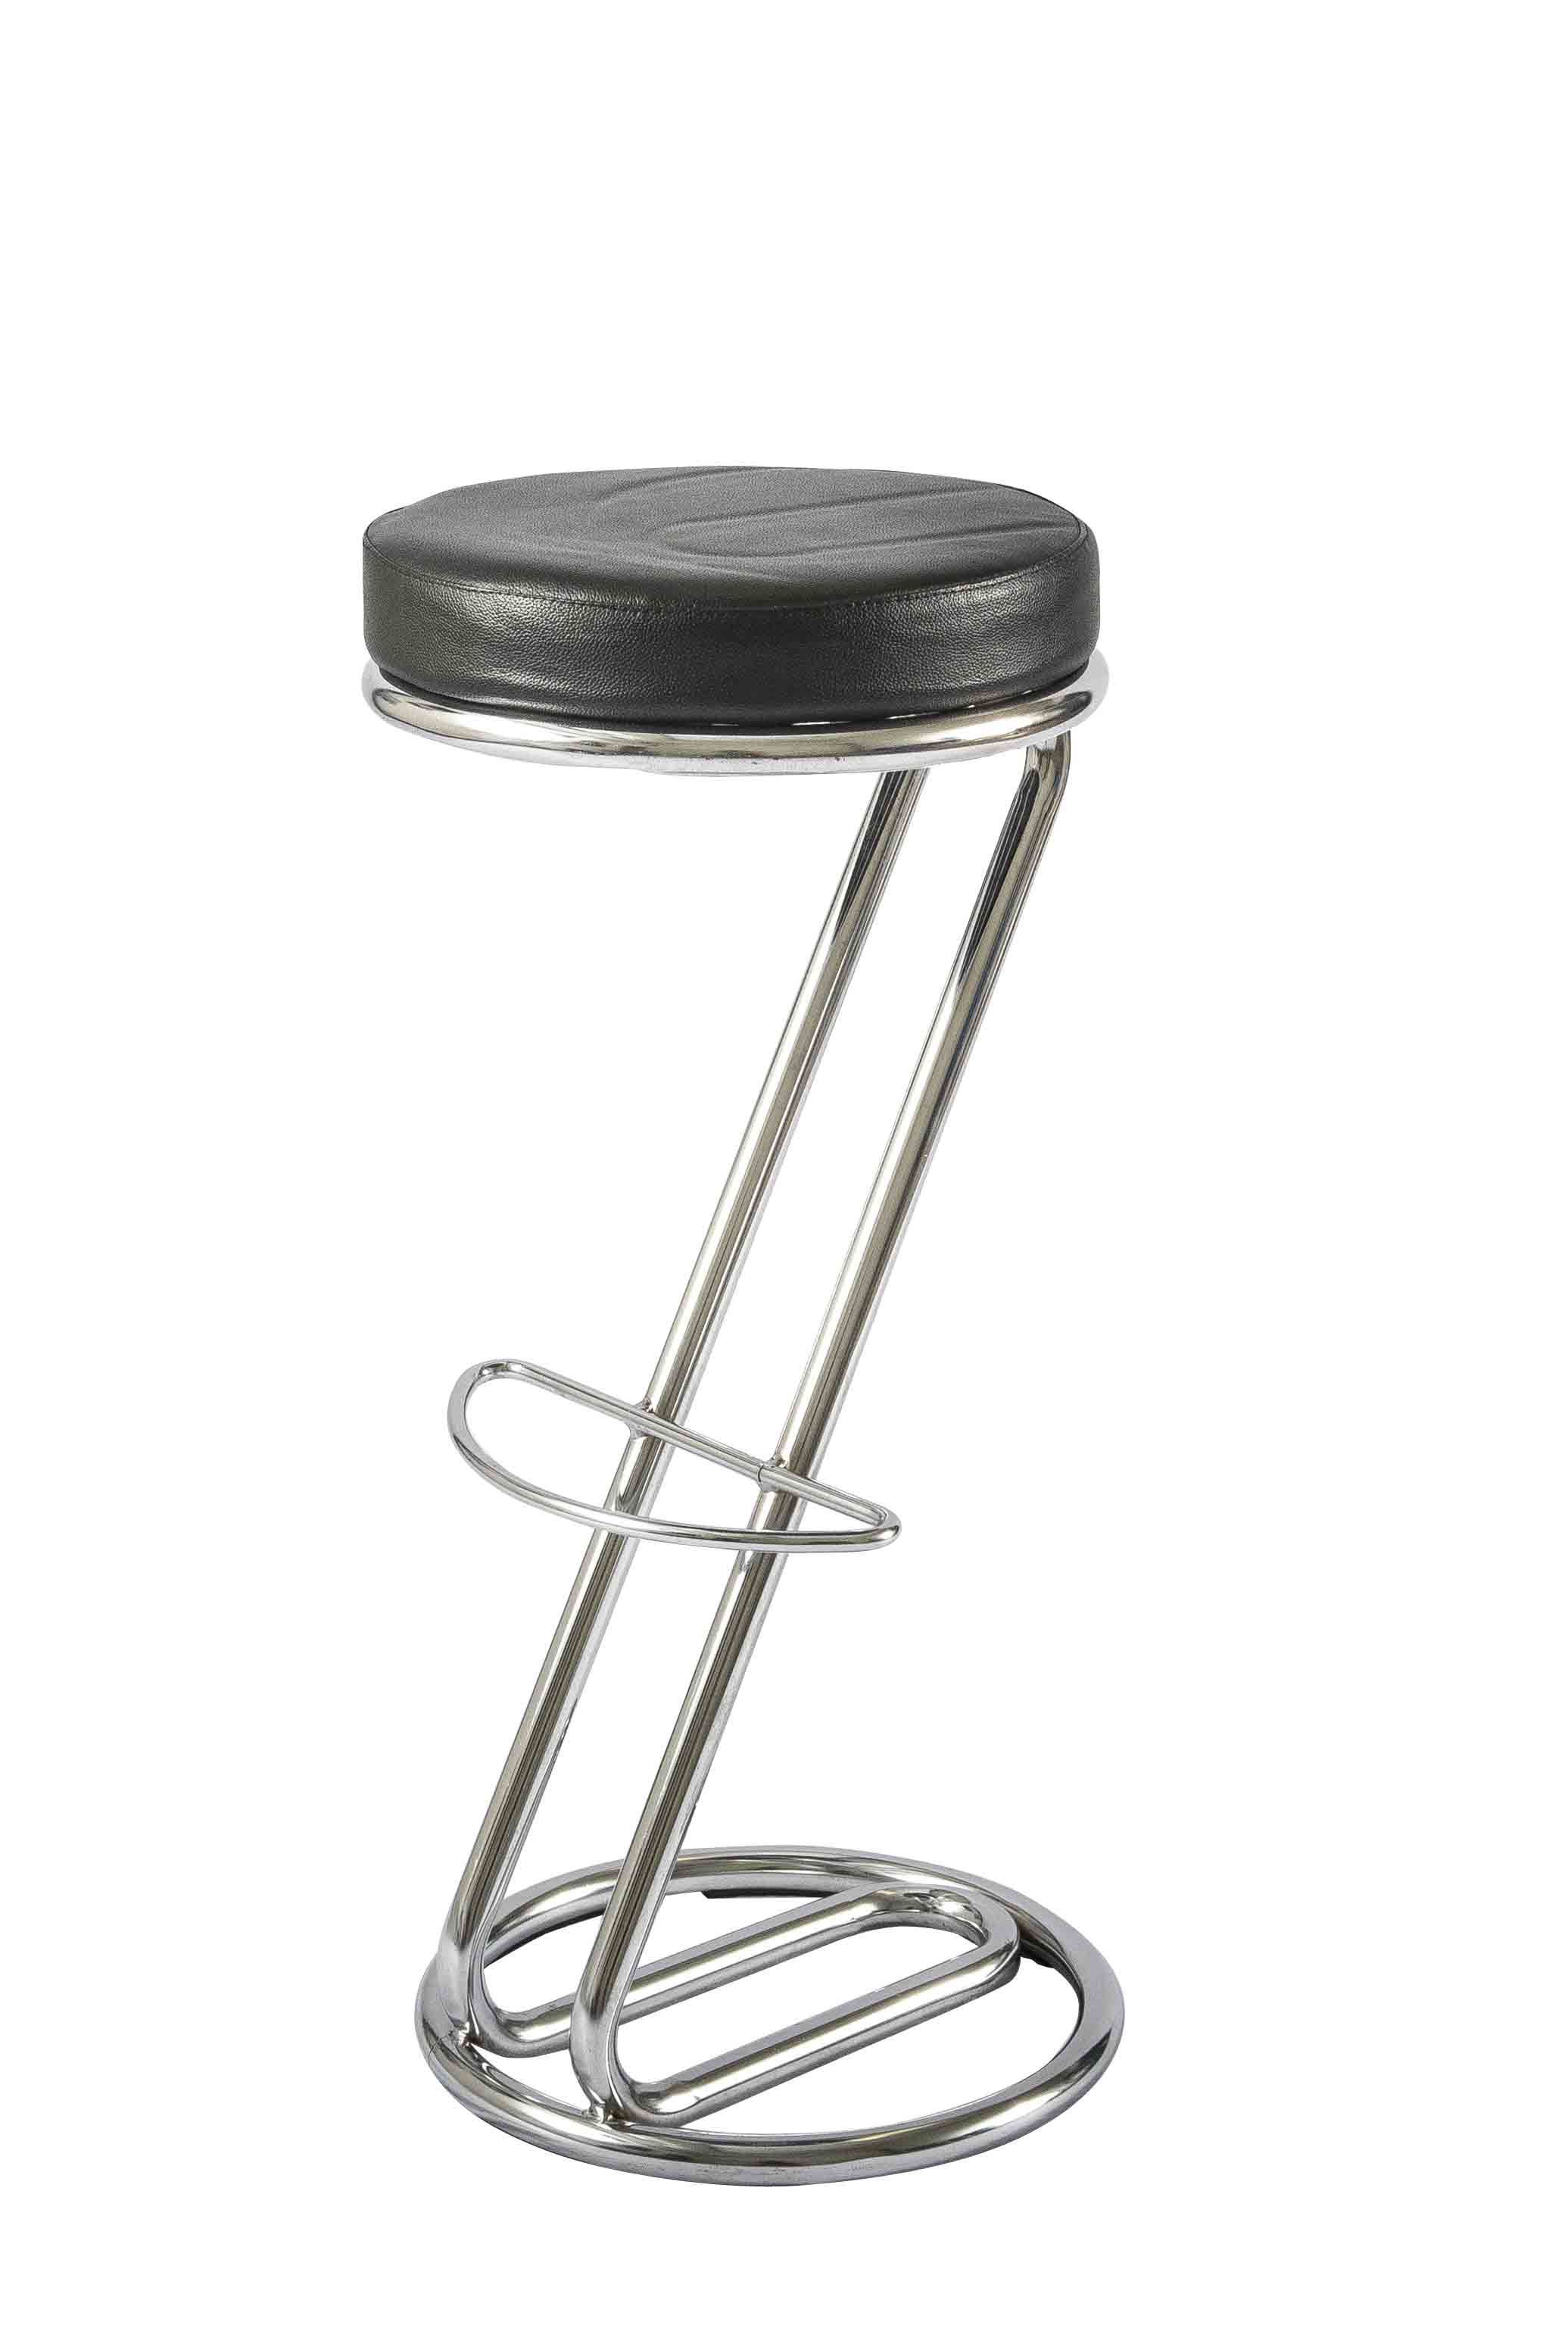 Bar Stool Z shape contemporary bar stool with a chrome